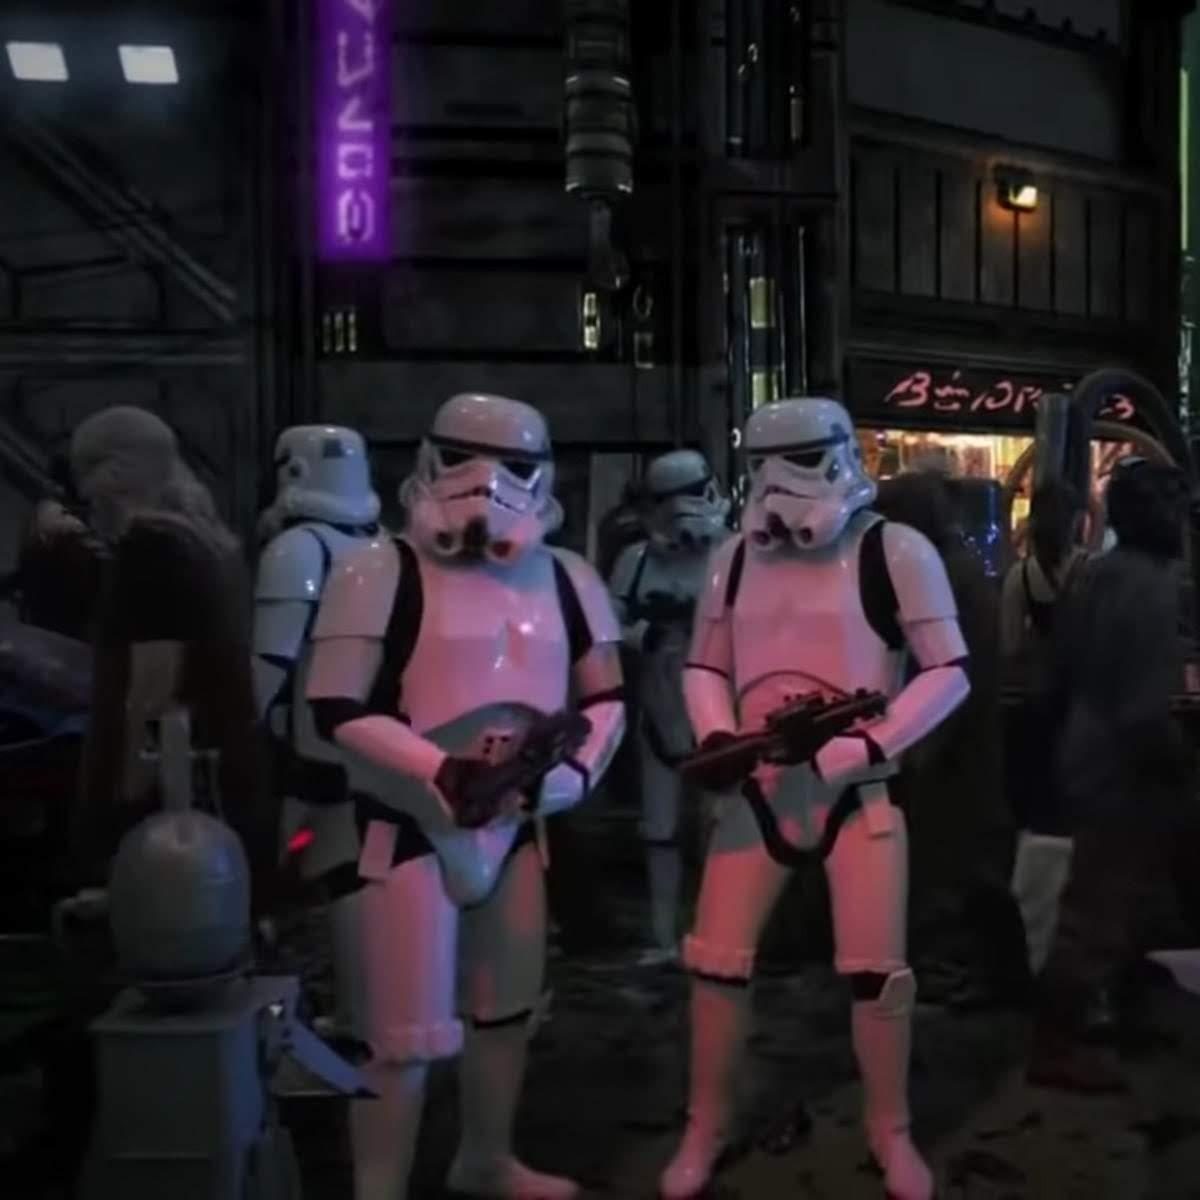 Star Wars Underworld :「スター・ウォーズ」の裏社会を描こうとした幻の実写テレビシリーズ「アンダーワールド」のテスト映像と撮影の様子のメイキング・ビデオがリークされた ! !